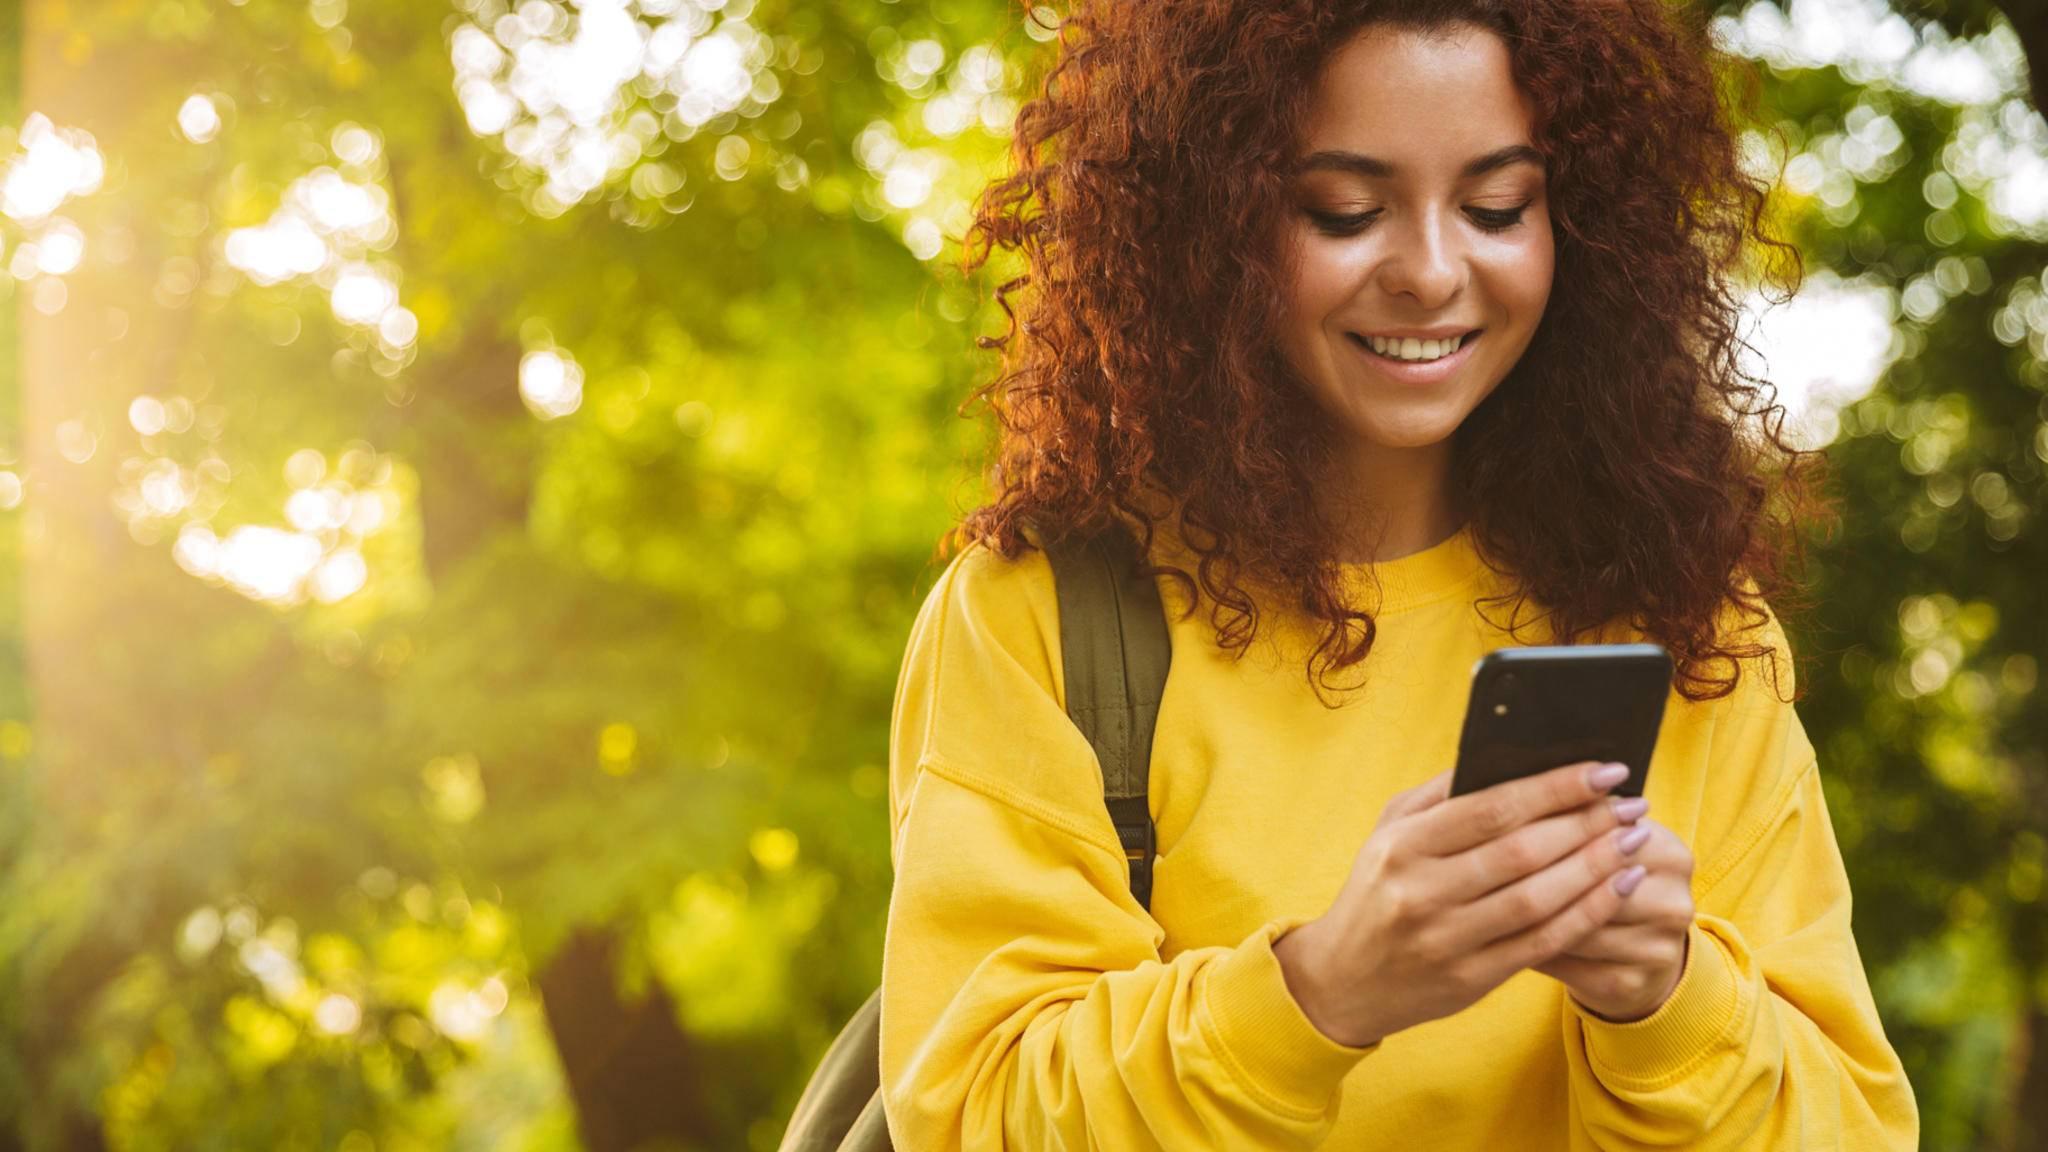 schrittzähler apps frau smartphone wald